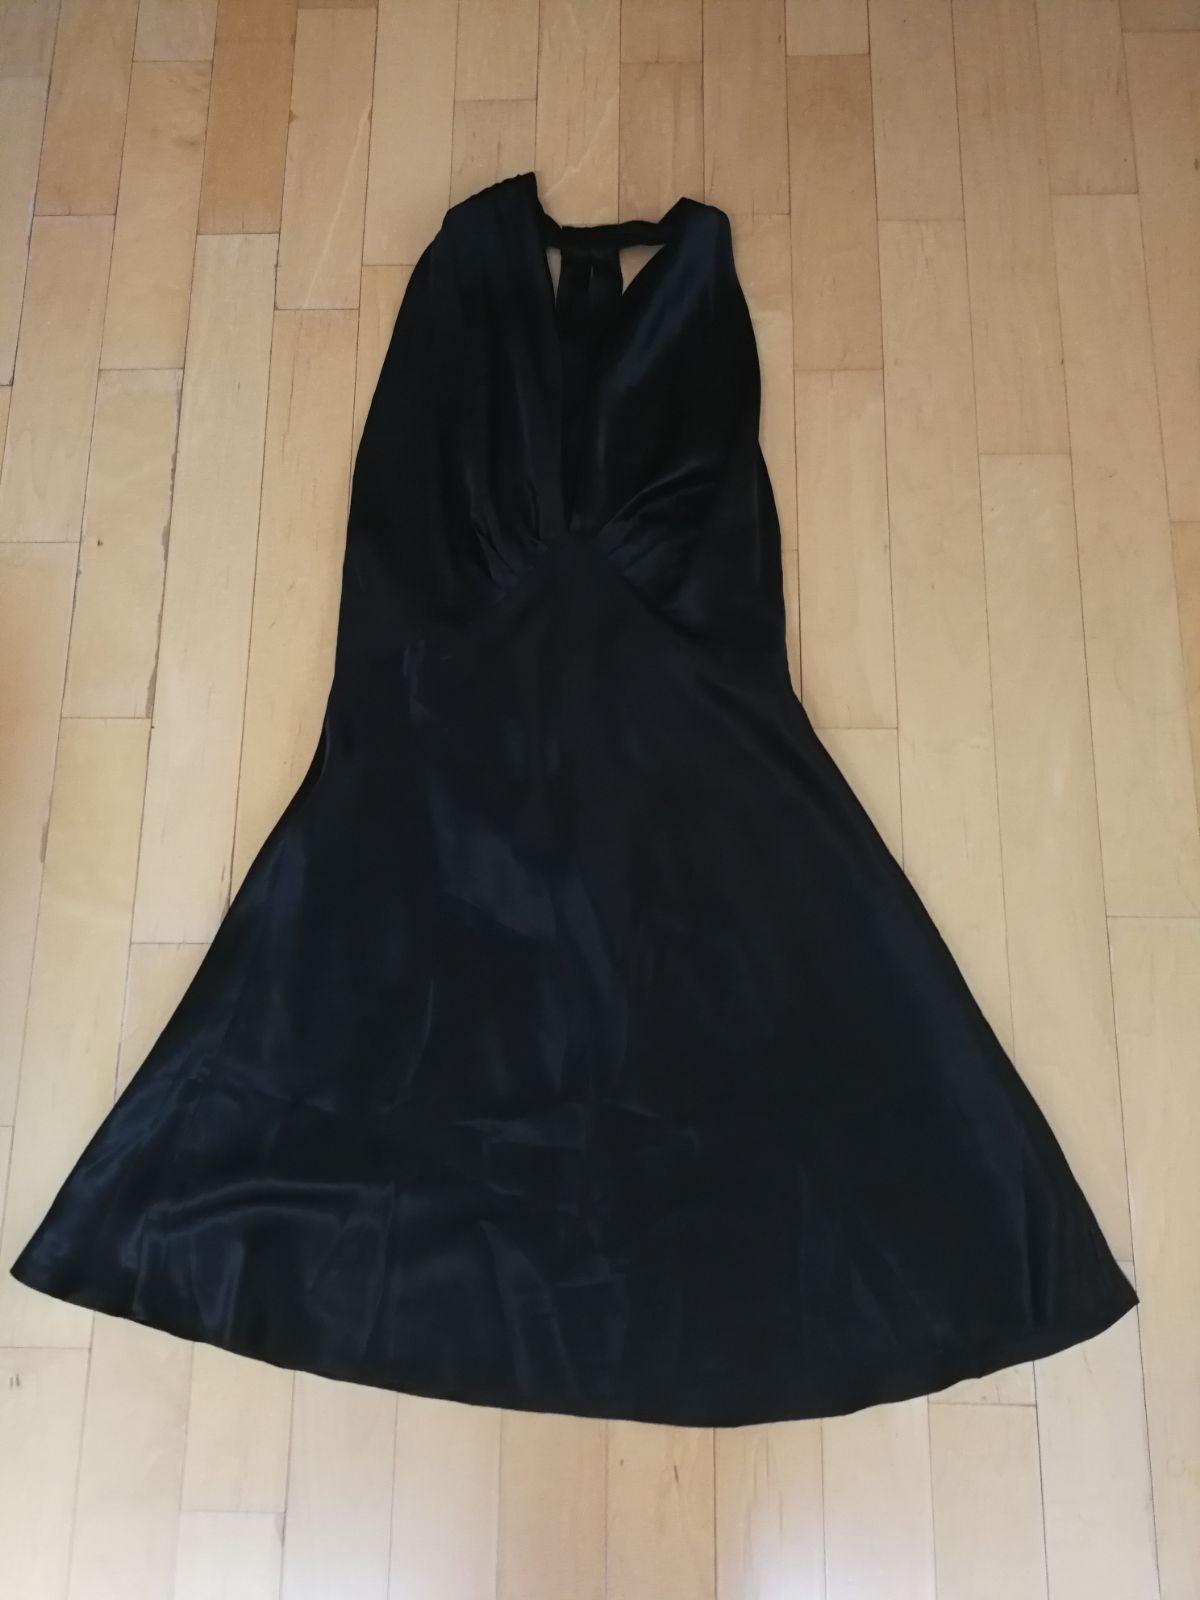 victoria secret silk black cami night go